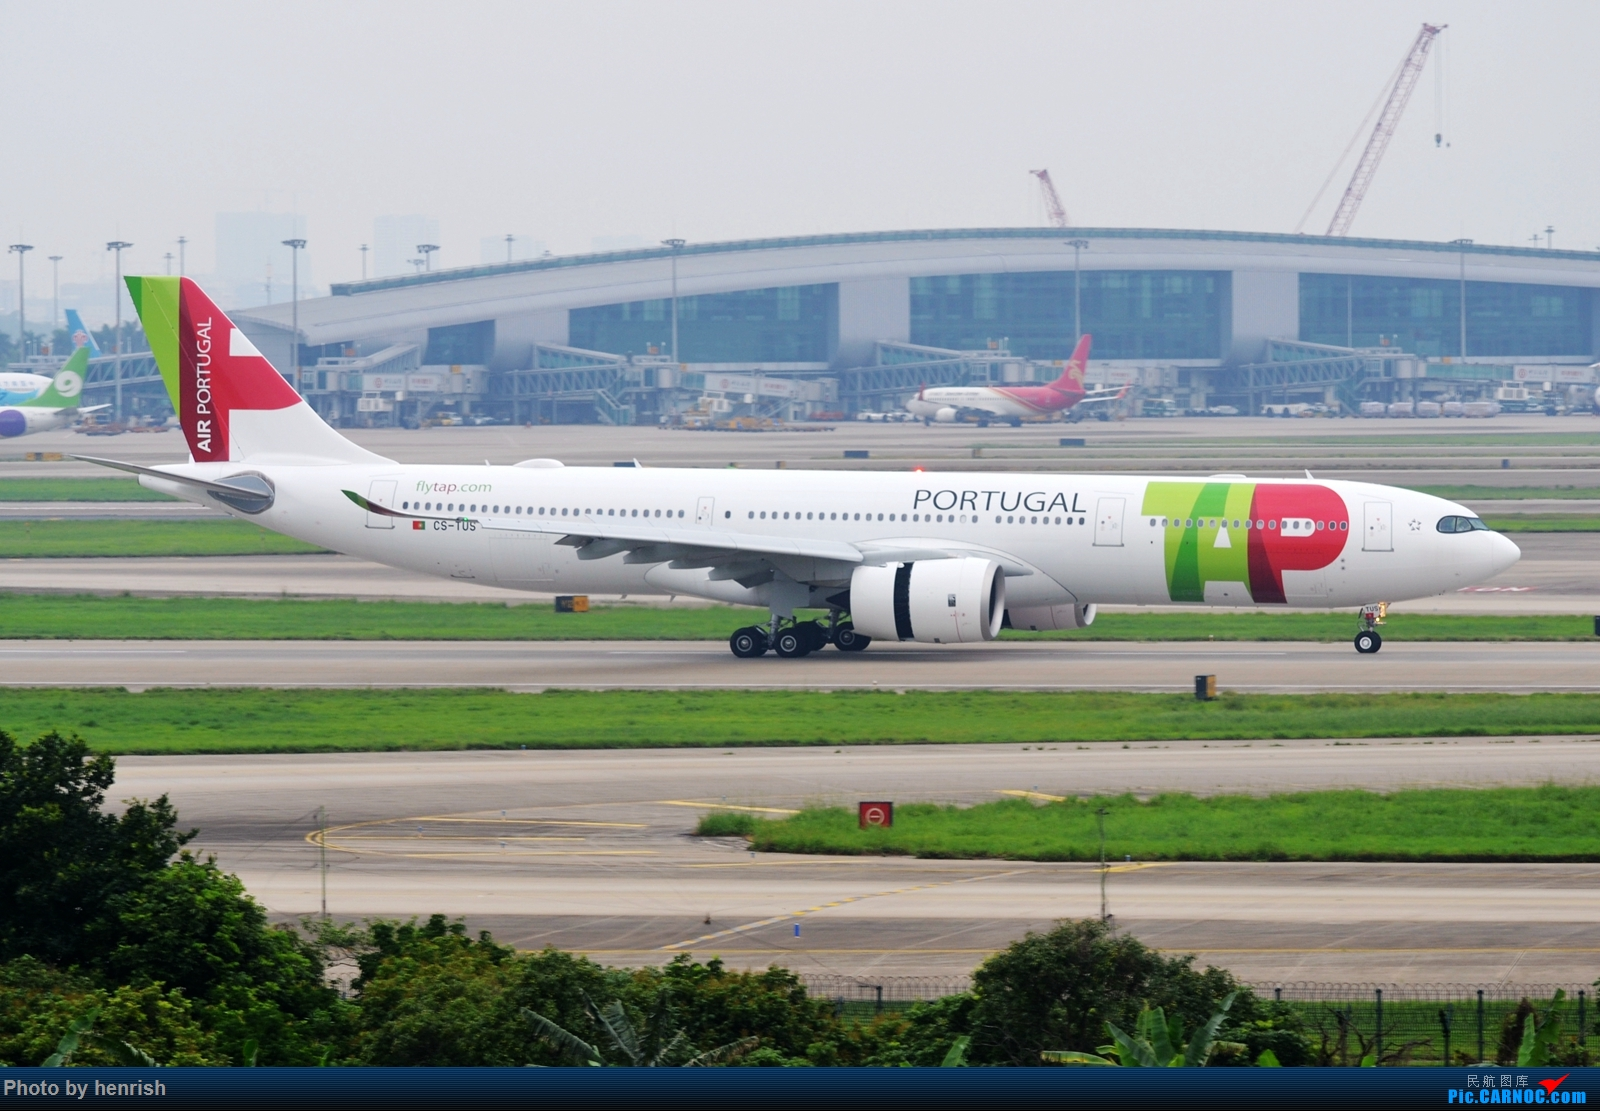 Re:[原创]【肥威的CAN】5月前半,疫情期间广州好货若干。【 广东青少年拍机小队】【广州,你好!】 AIRBUS A330-900 CS-TUS 中国广州白云国际机场